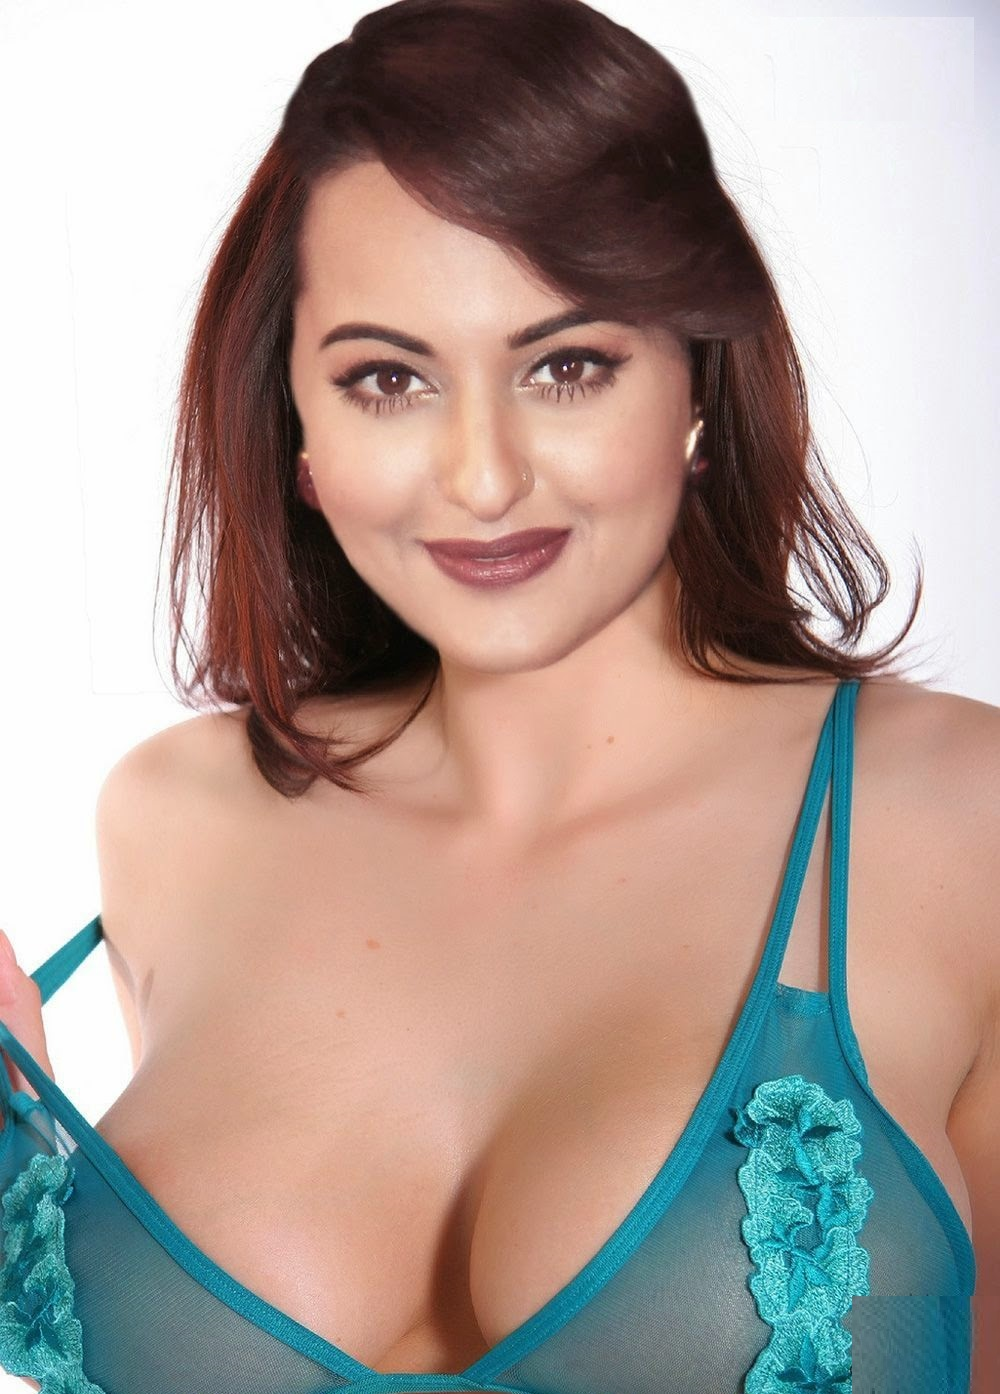 Nude sonakshi sinha Sonakshi Sinha